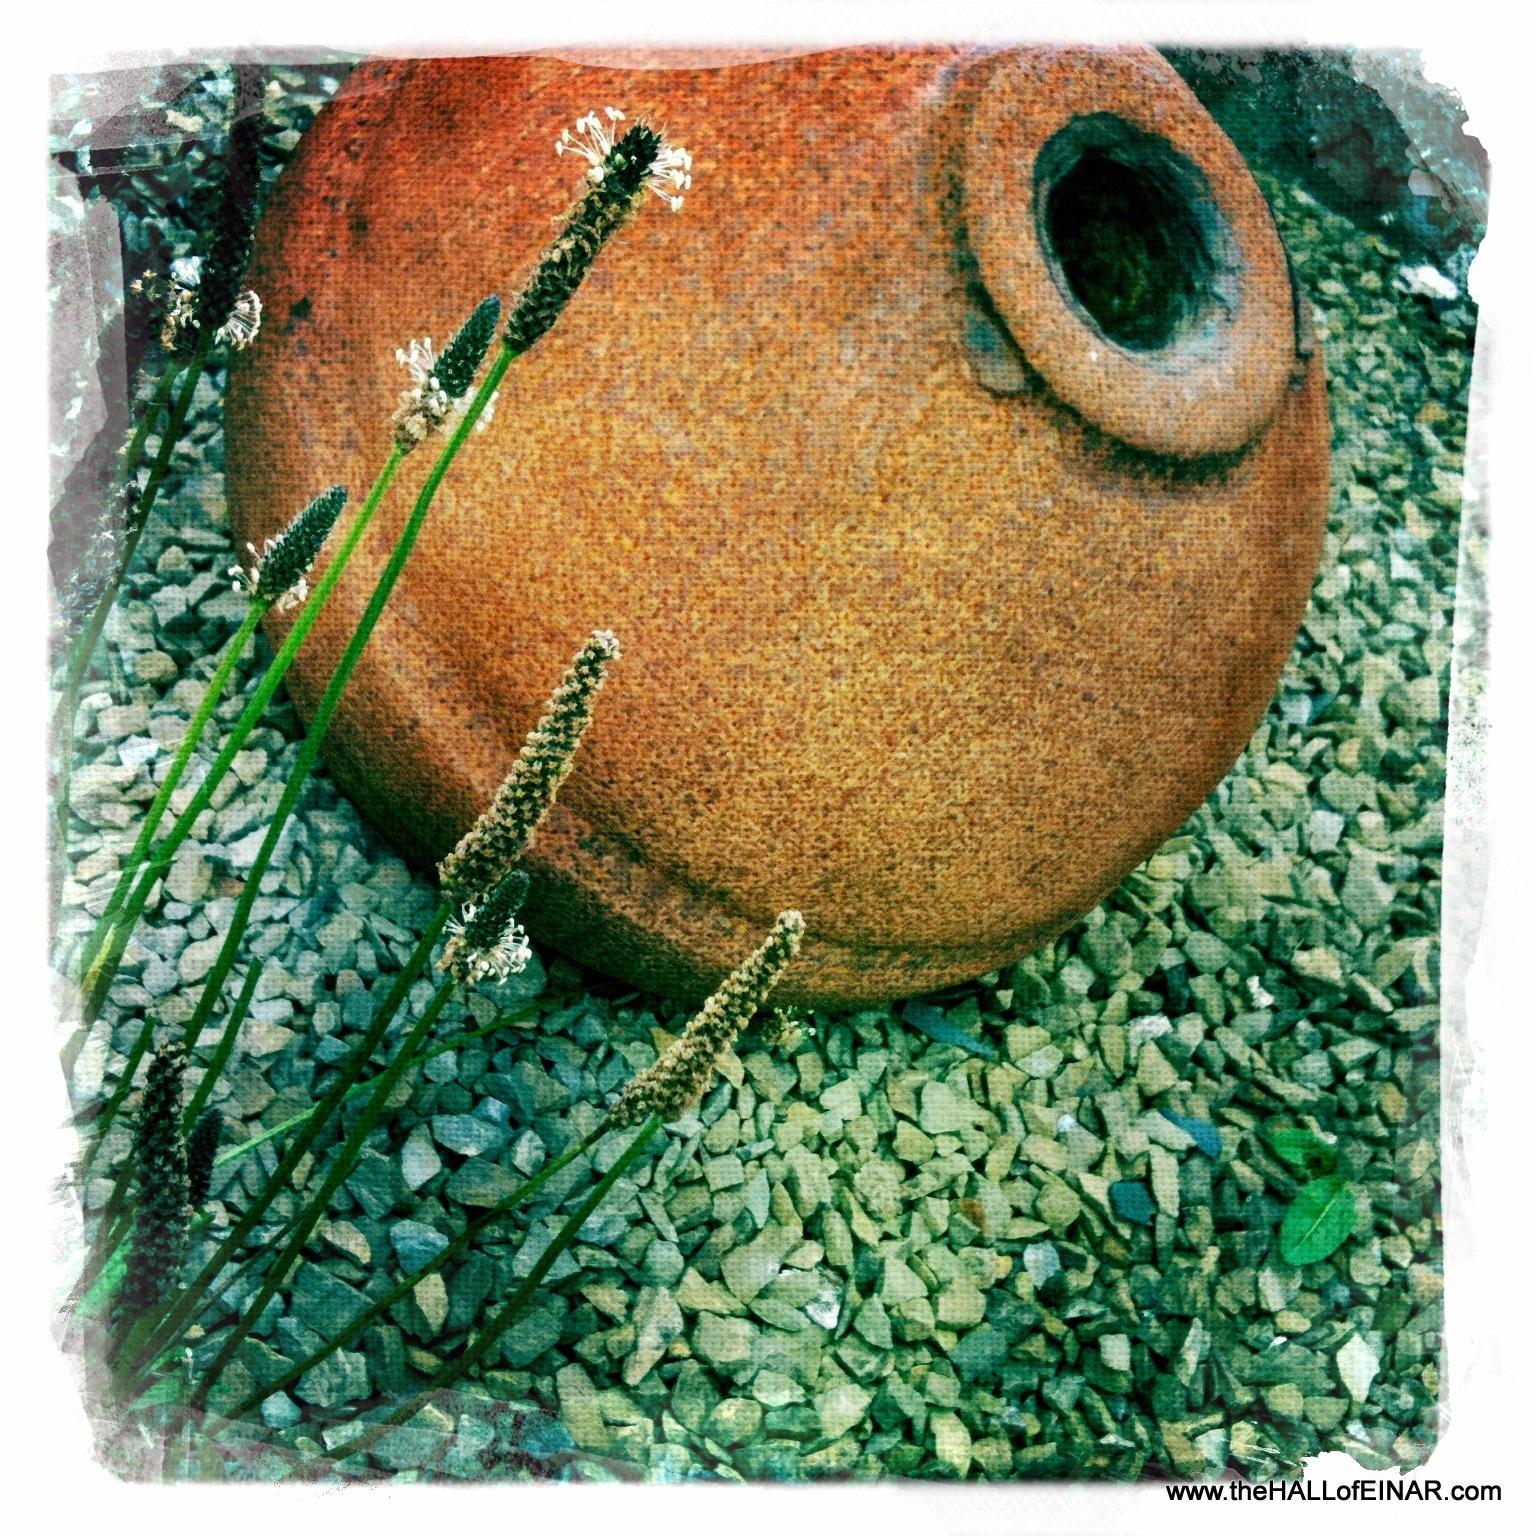 Rusting metal buoy